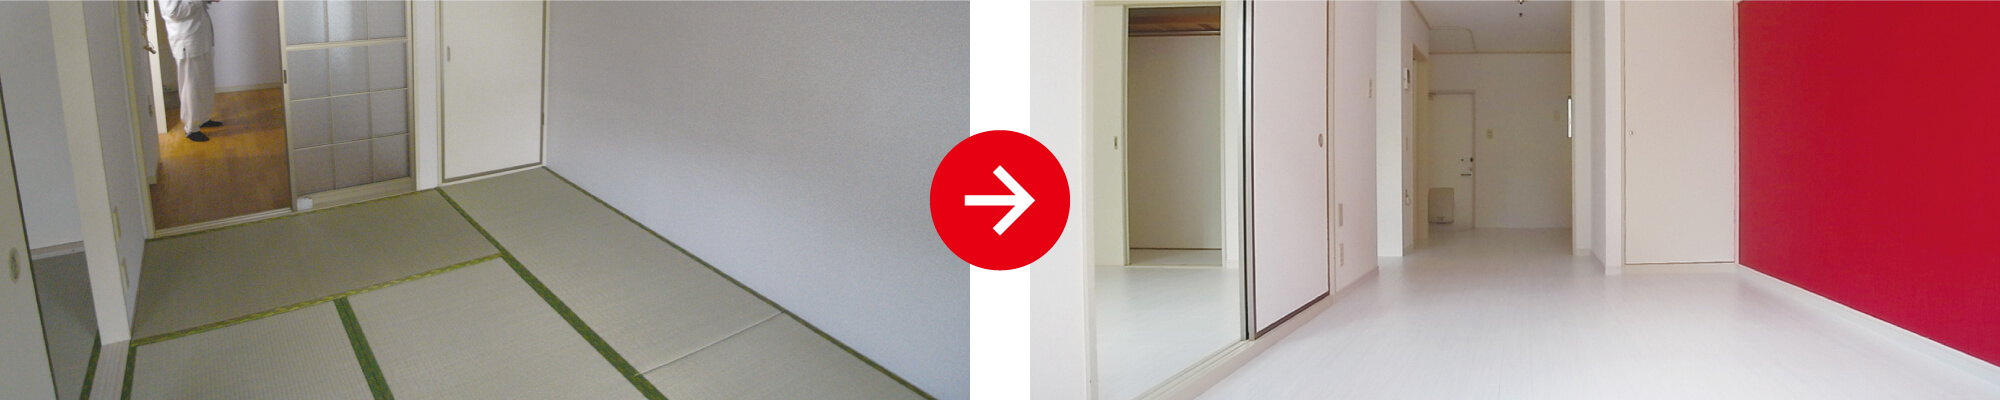 POINT 03┃空室対策・リノベーション提案